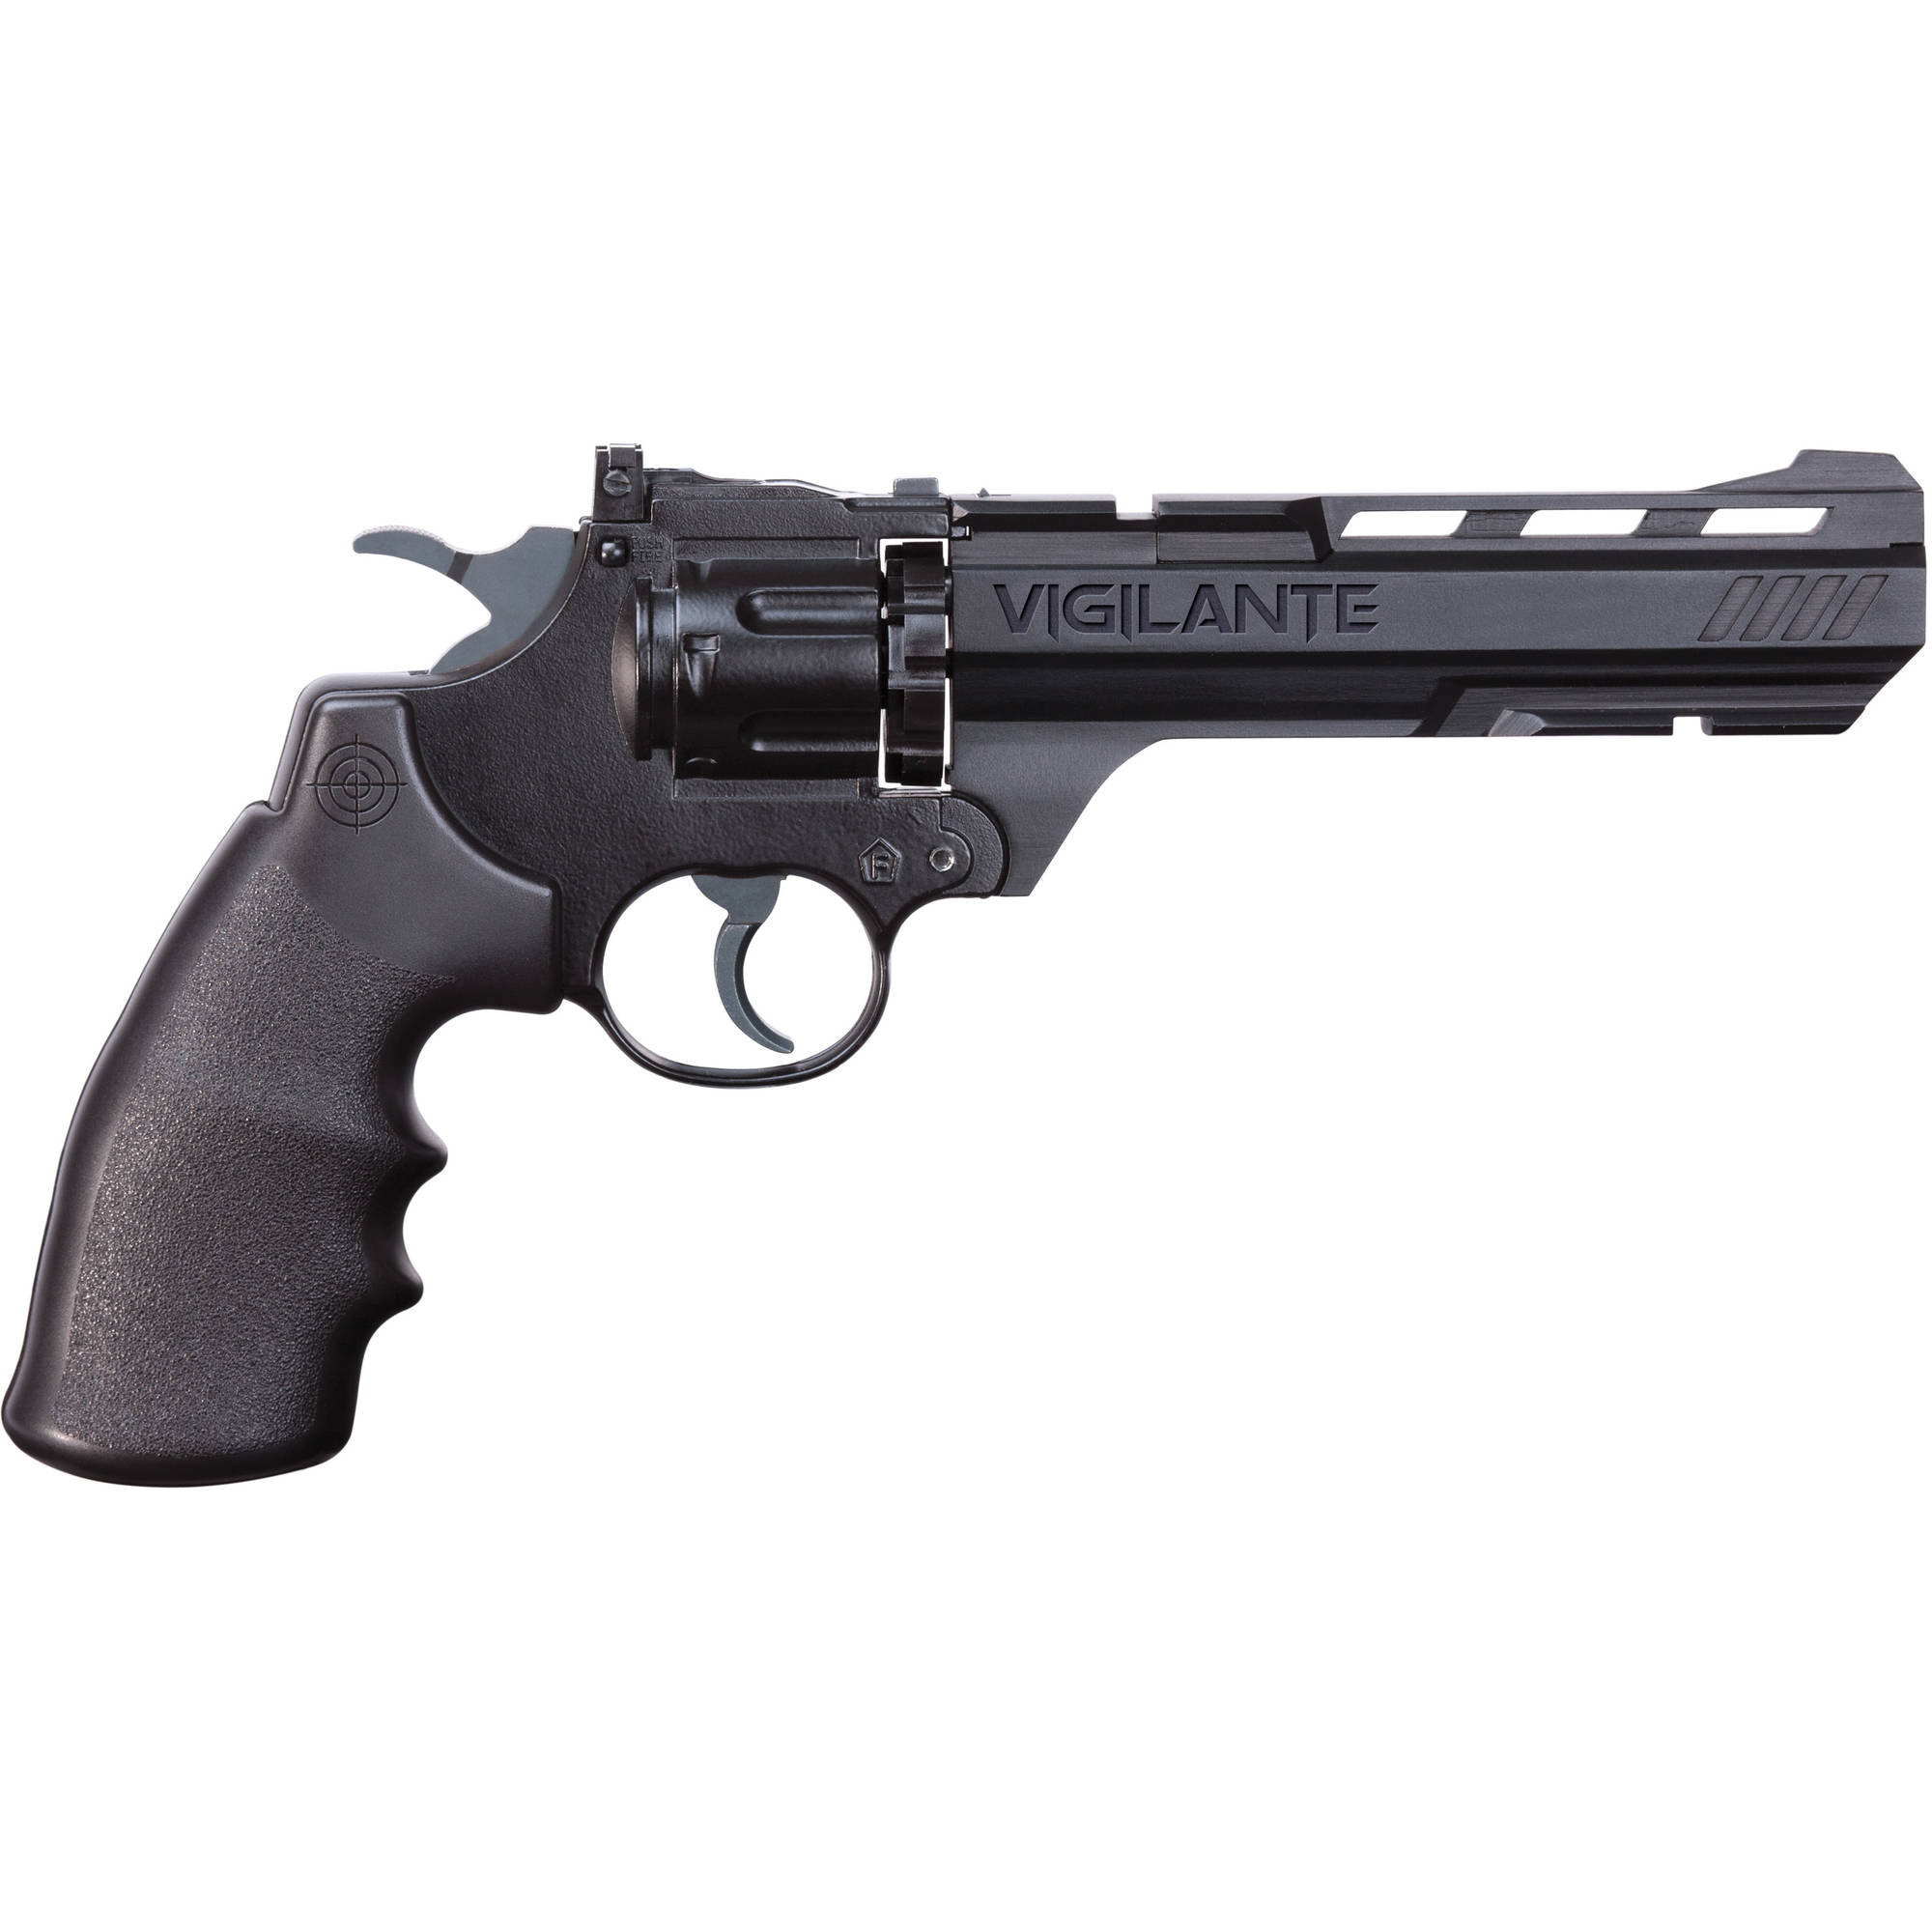 Crosman Vigilante Revolver .177 Caliber CO2 Air Pistol, 465fps by Crosman